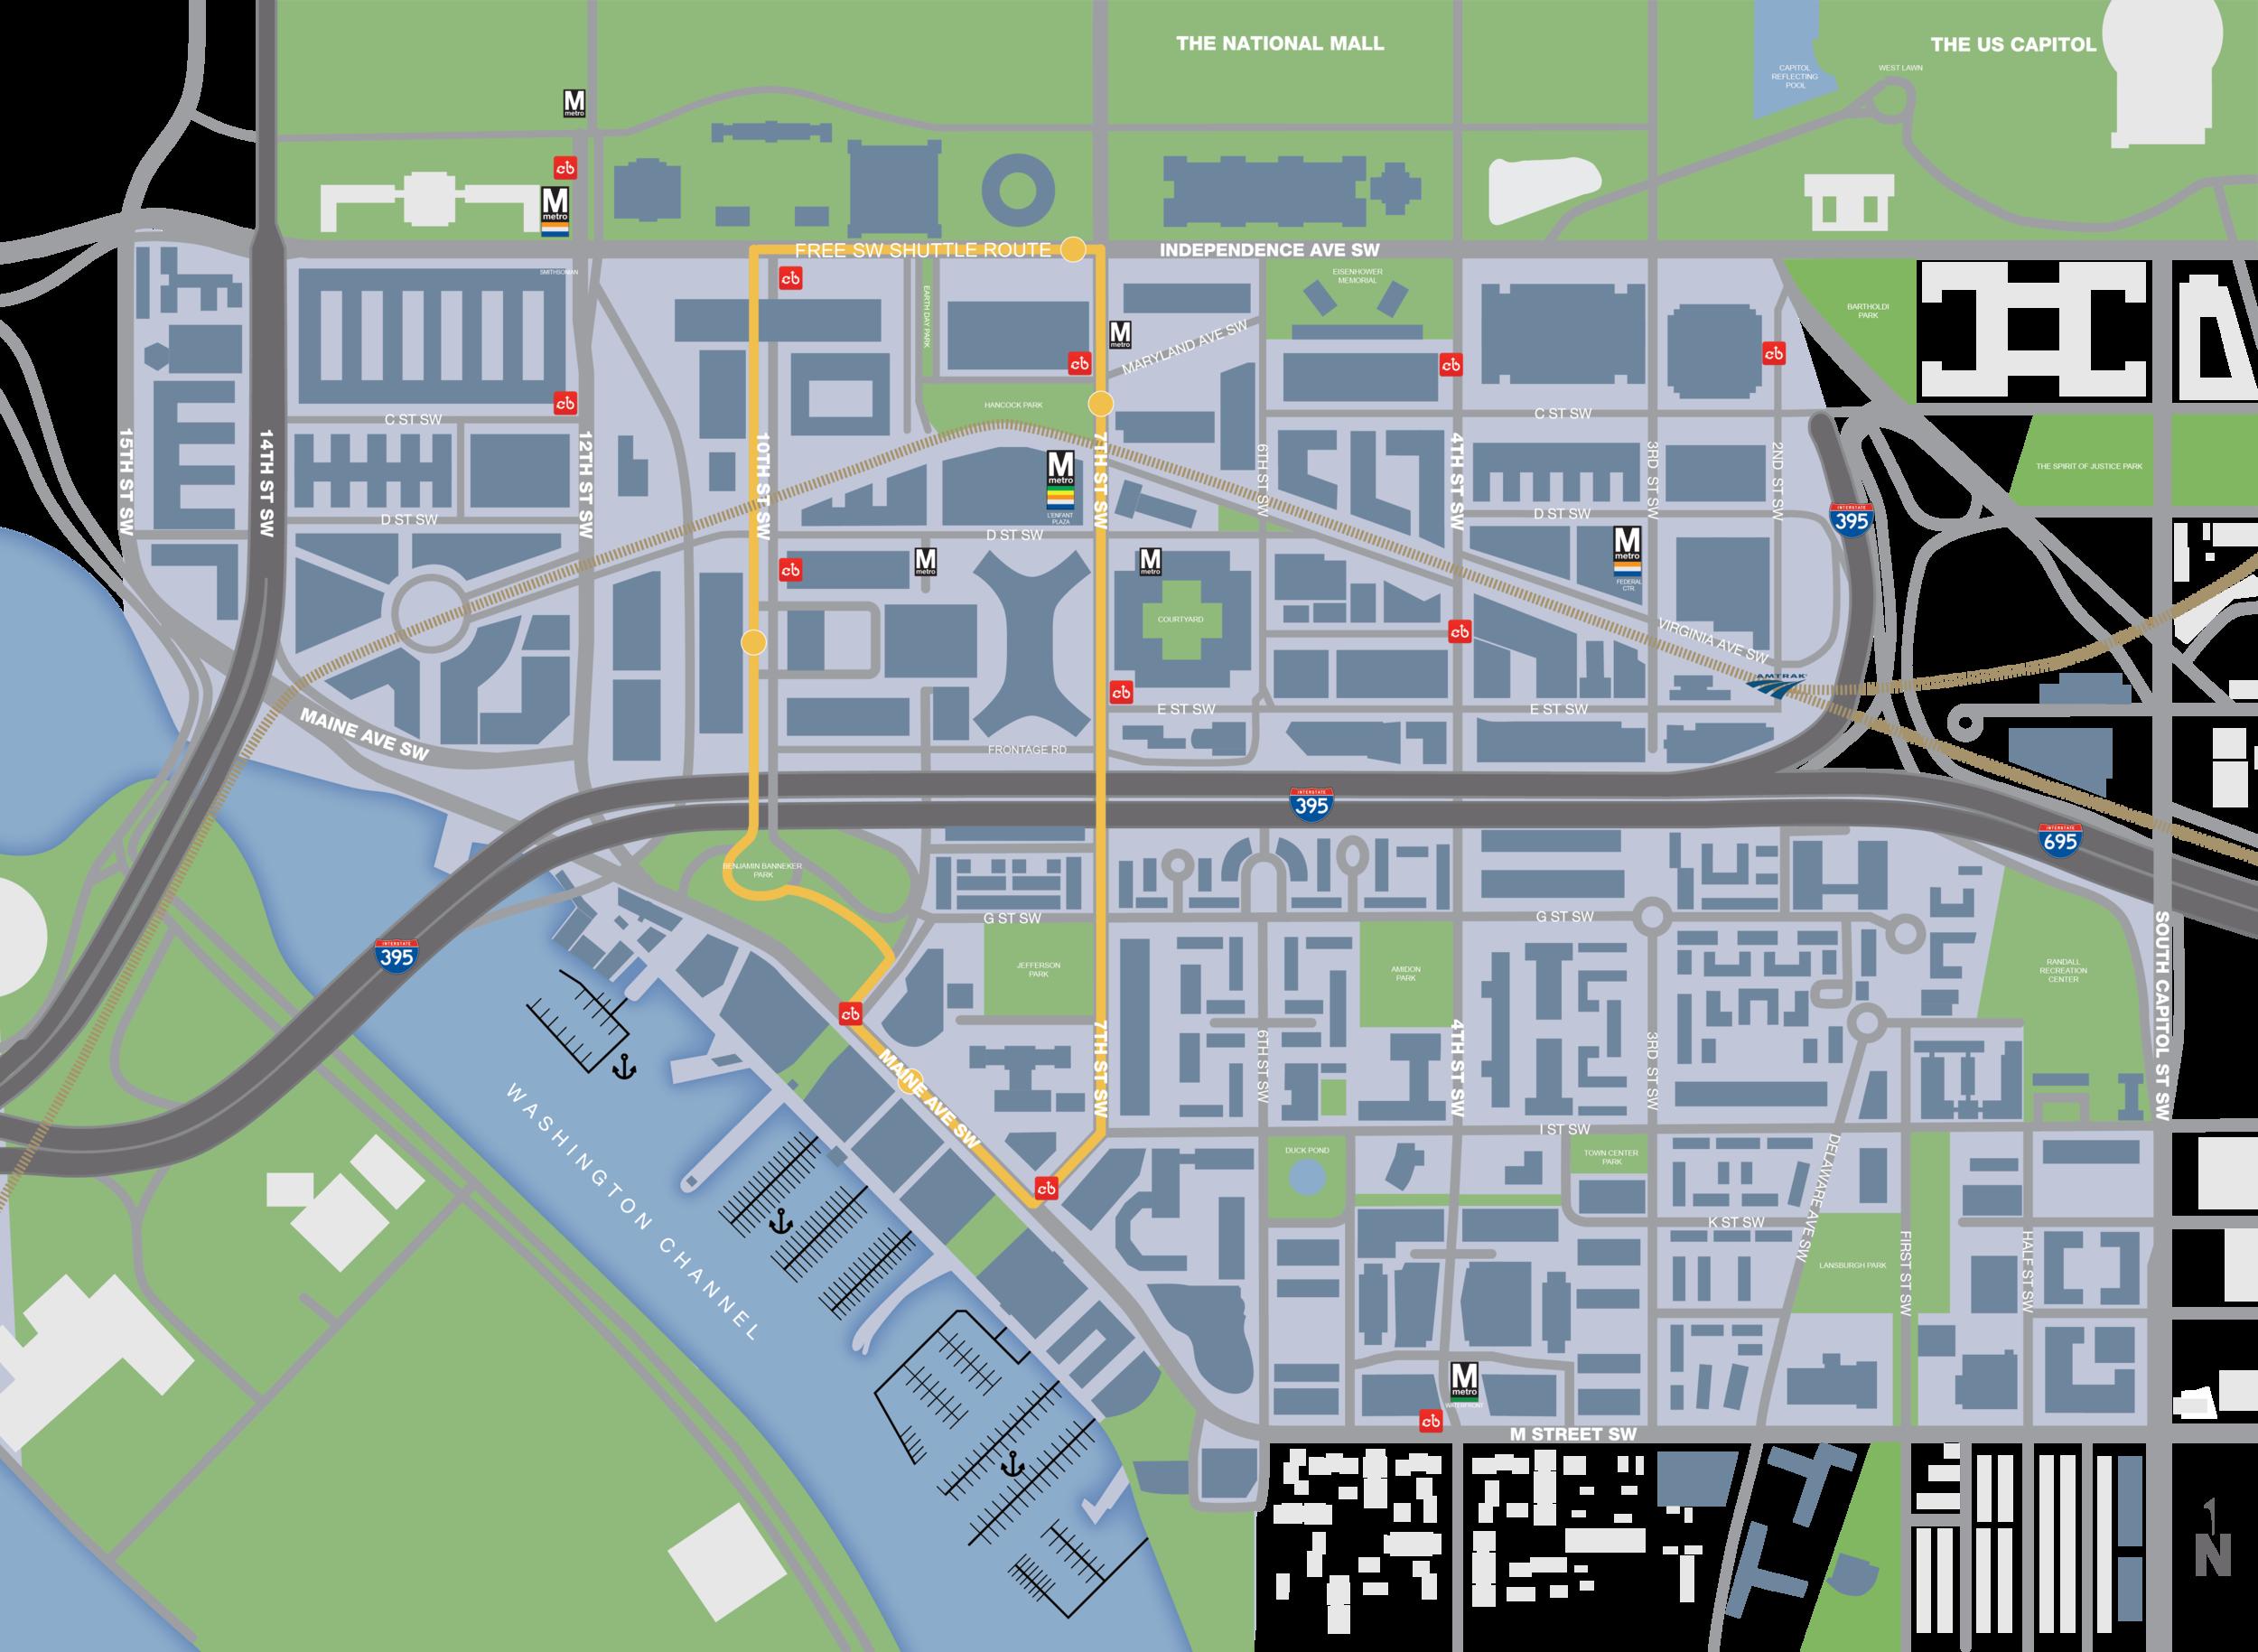 SWBID area in grey